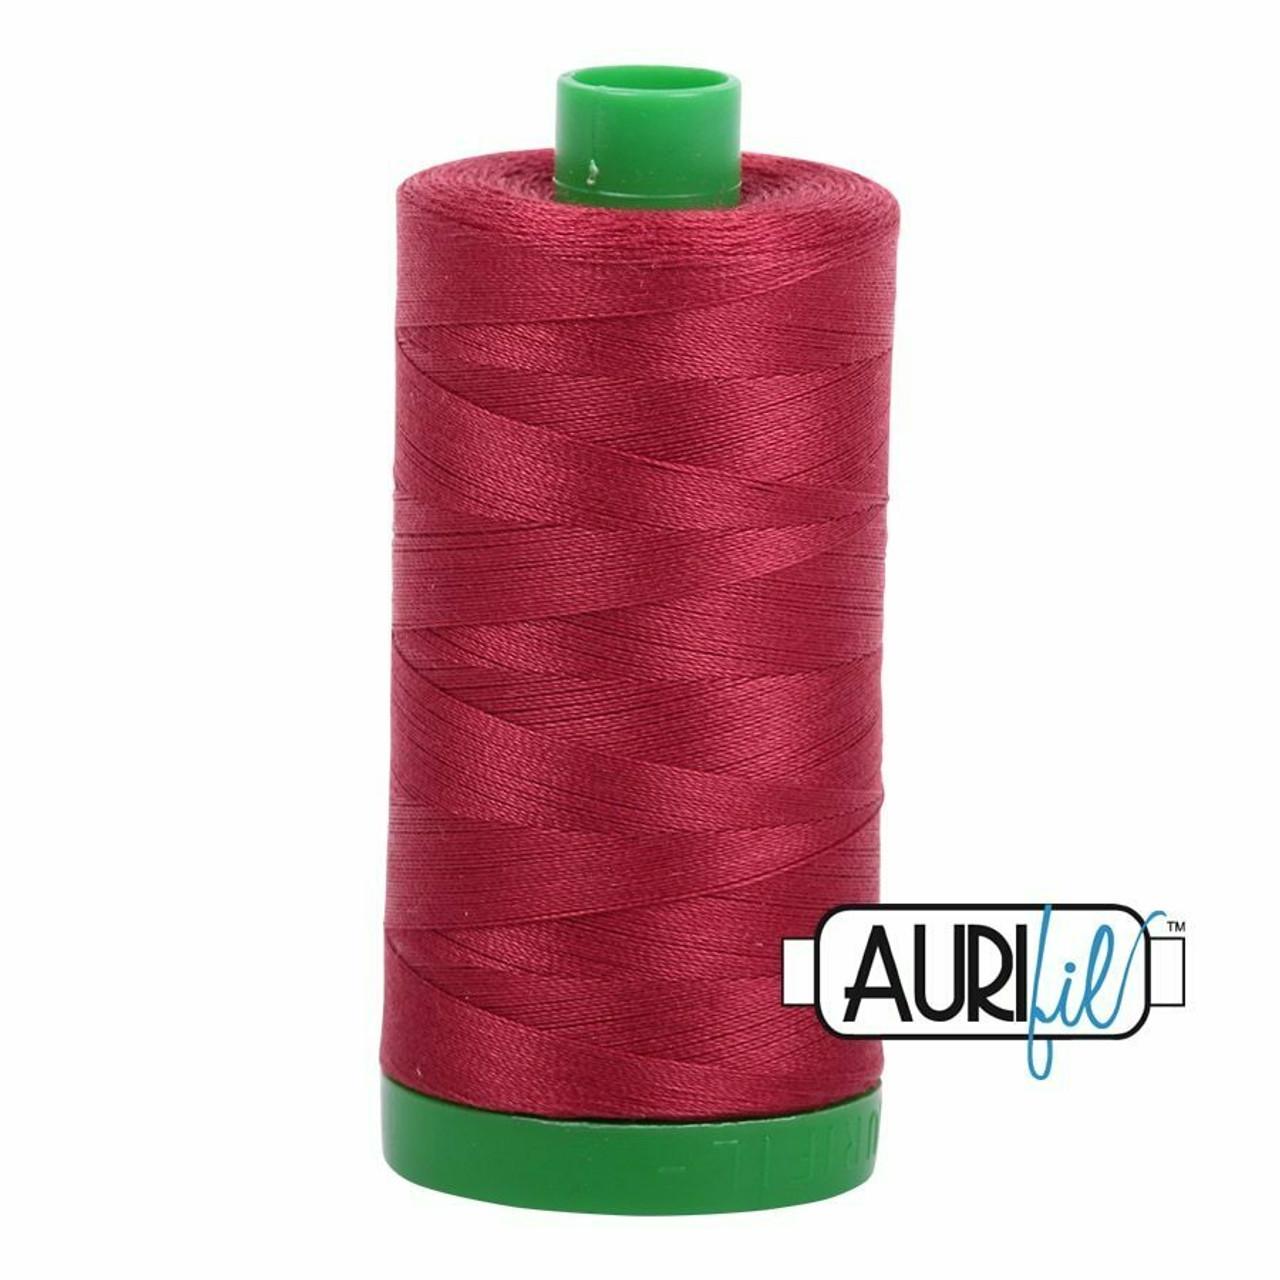 Aurifil 40wt Burgundy (1103) thread